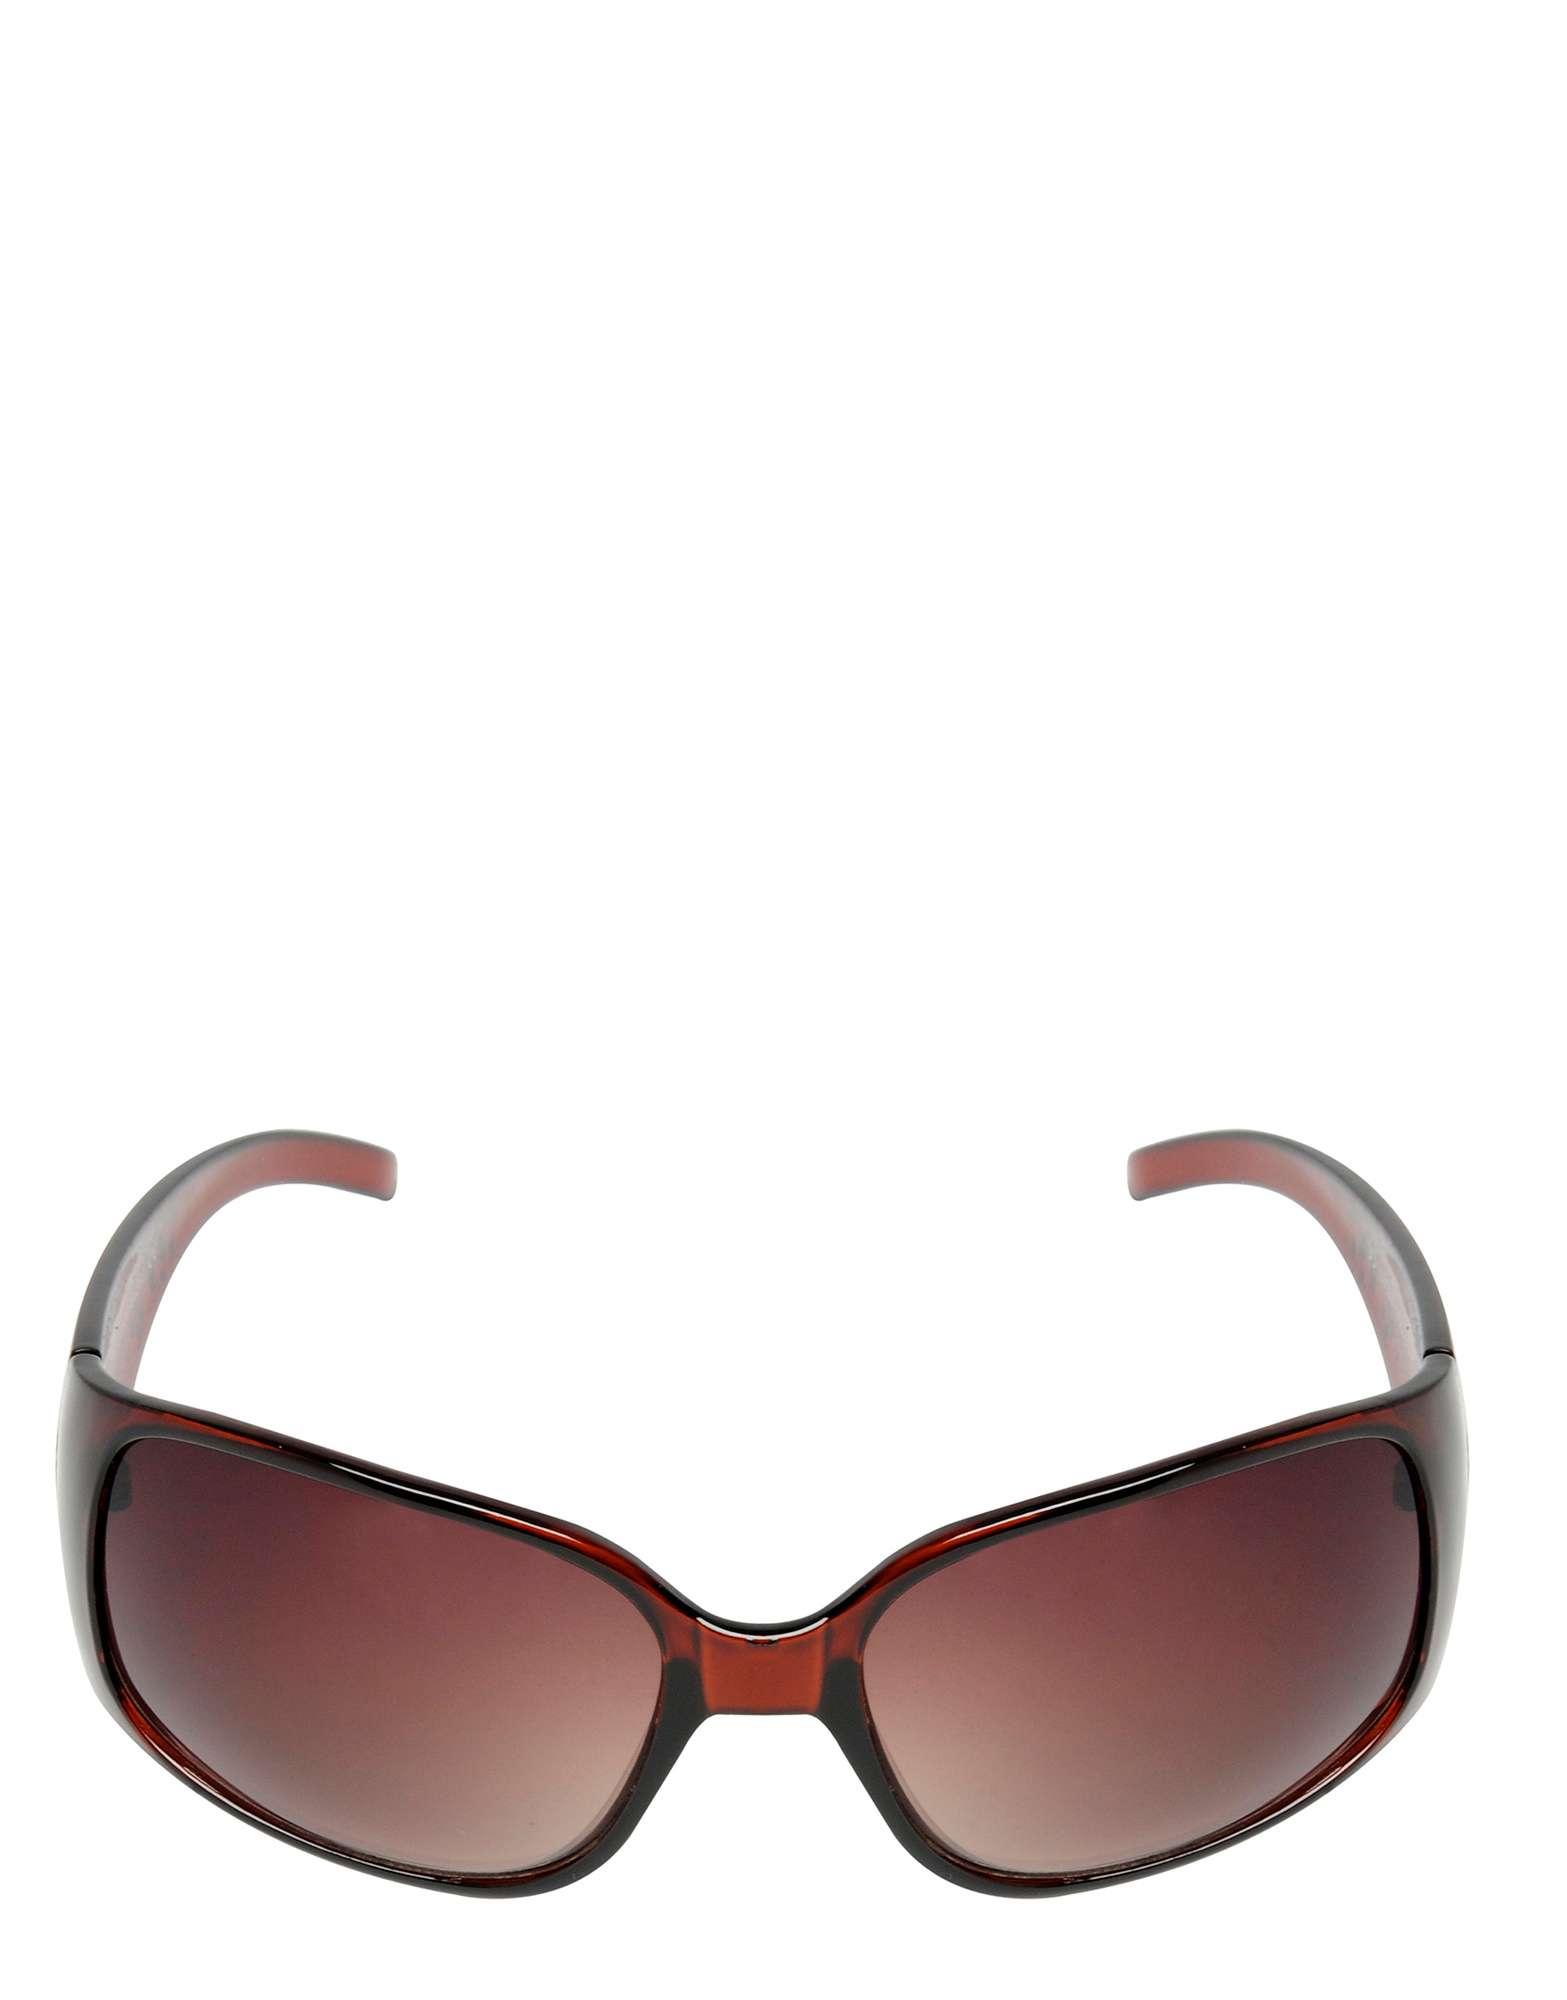 Brookhaven Betsy Rectangle Shape Sunglasses